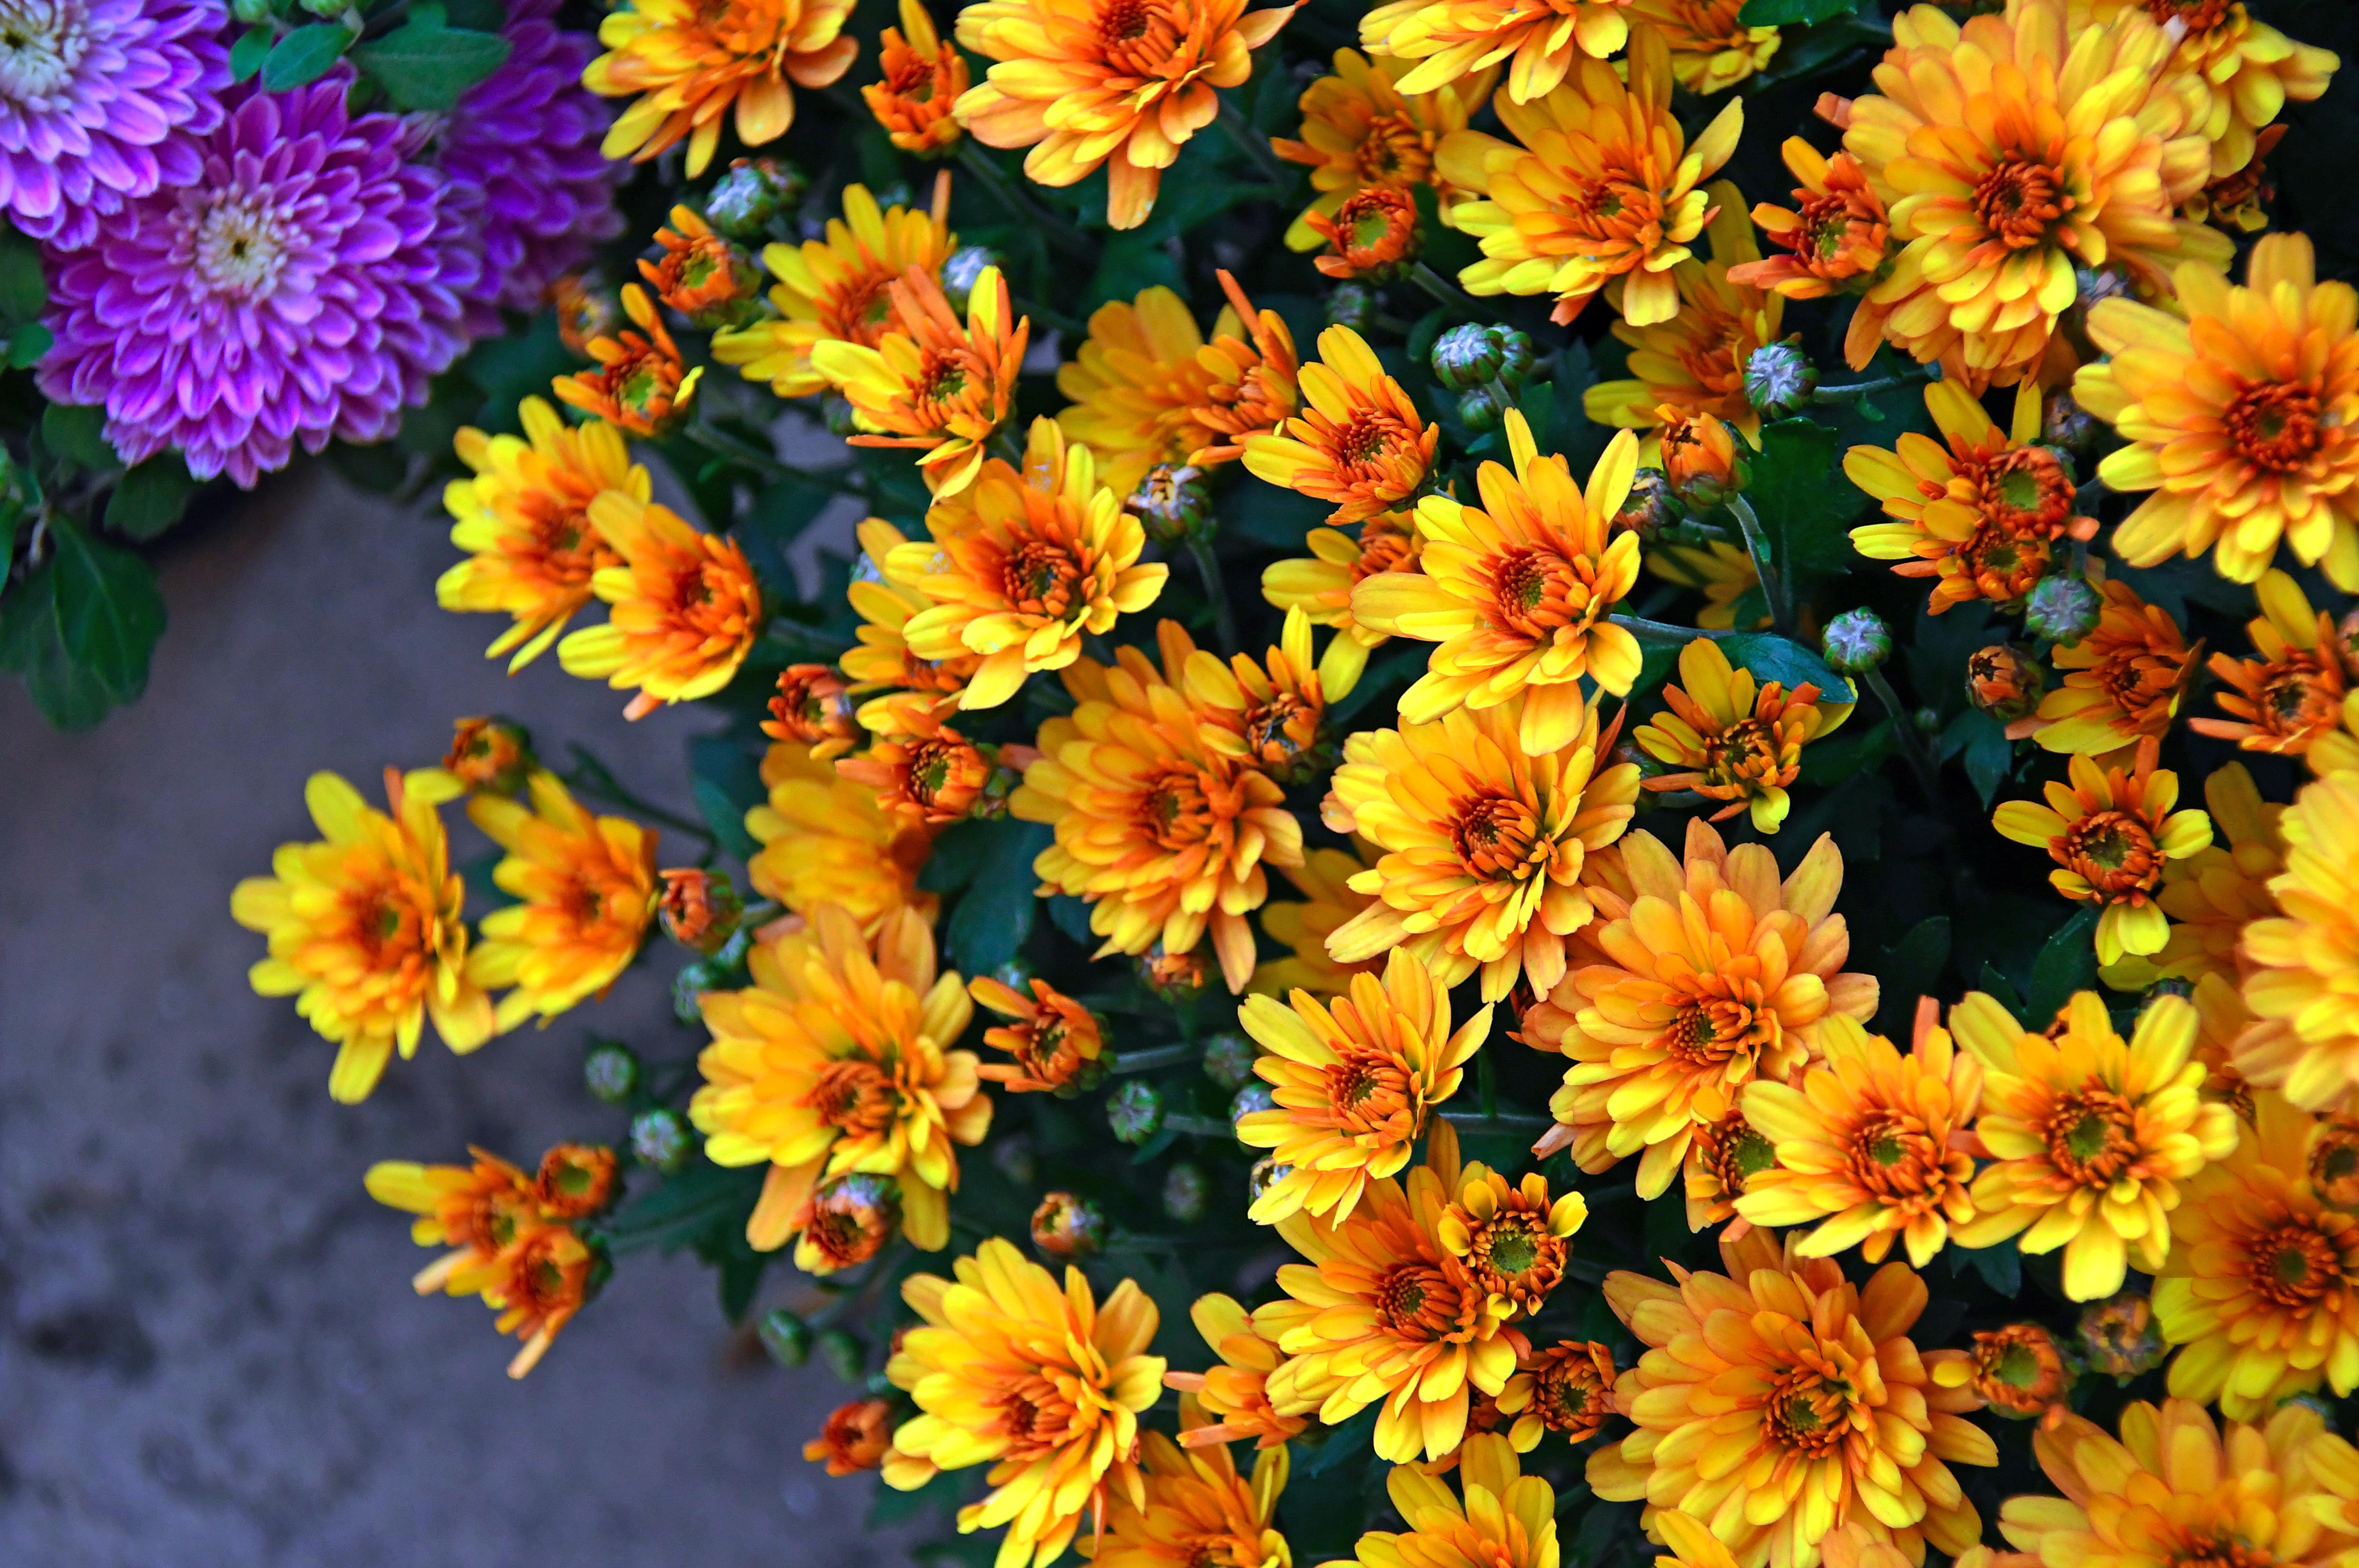 Free Images Chrysanthemum Yellow Chrysanthemums Flower Flowers